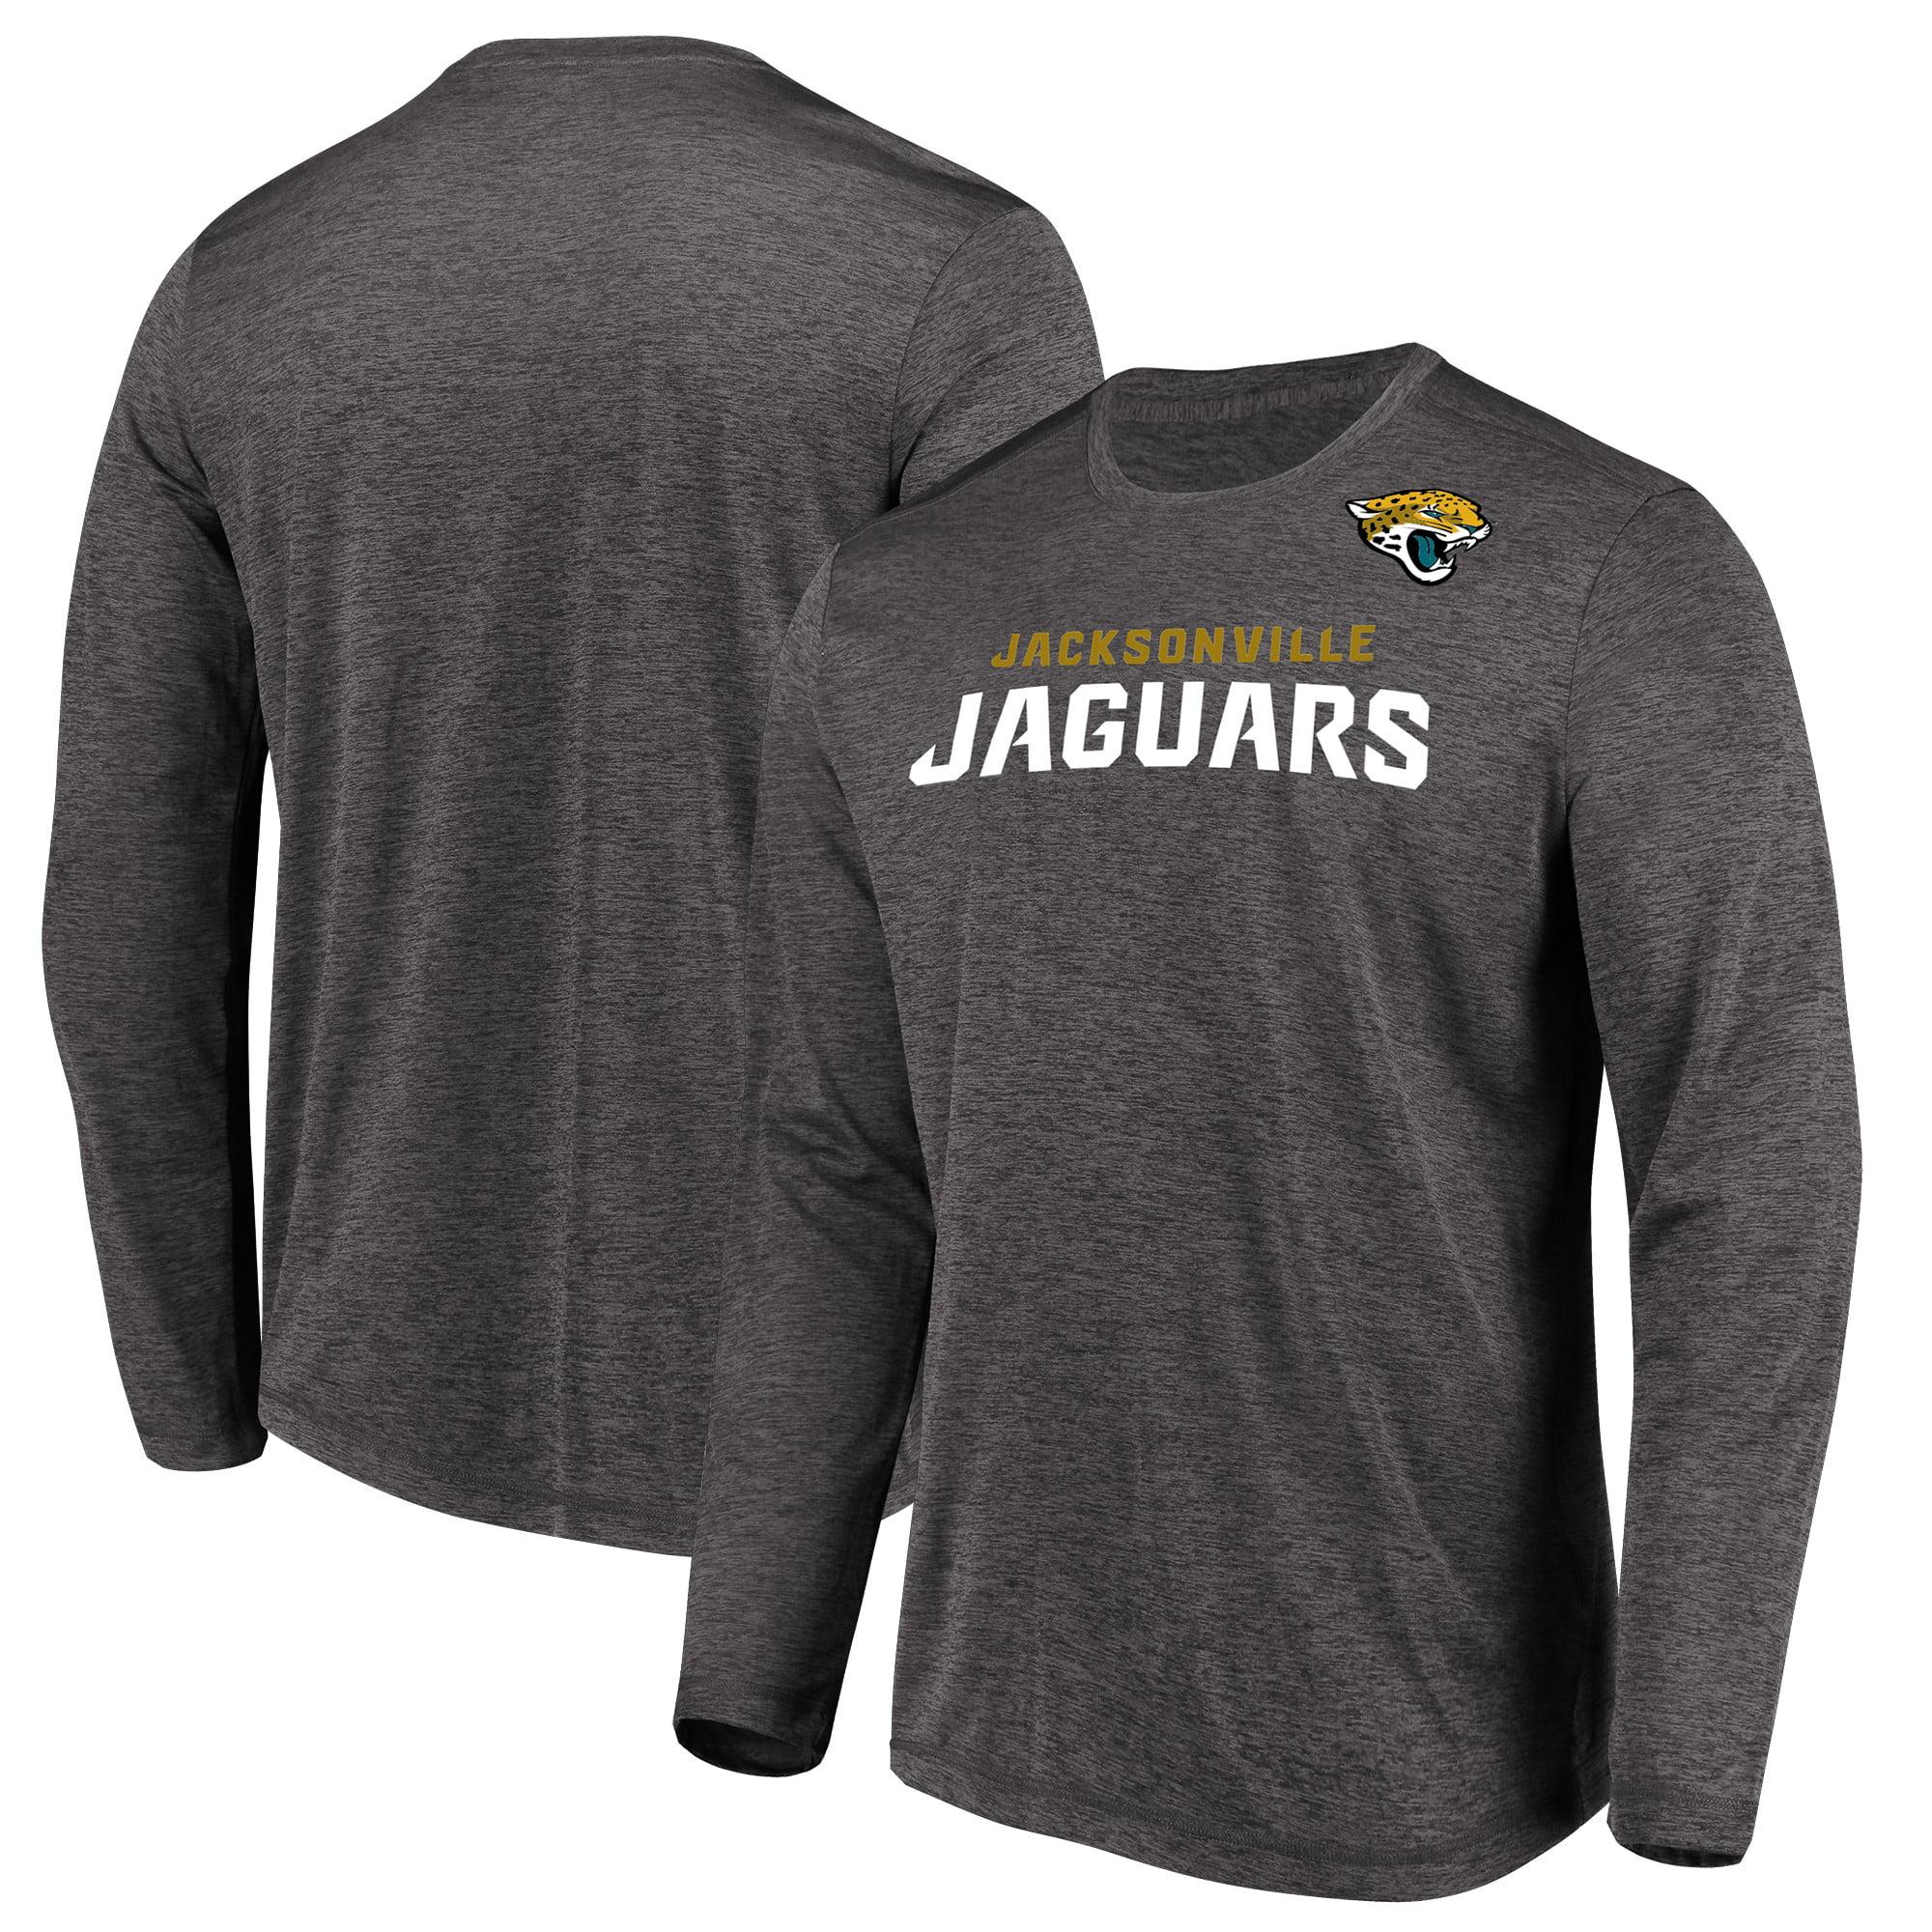 Jacksonville Jaguars Majestic Touchback Long Sleeve T-Shirt - Heathered Charcoal